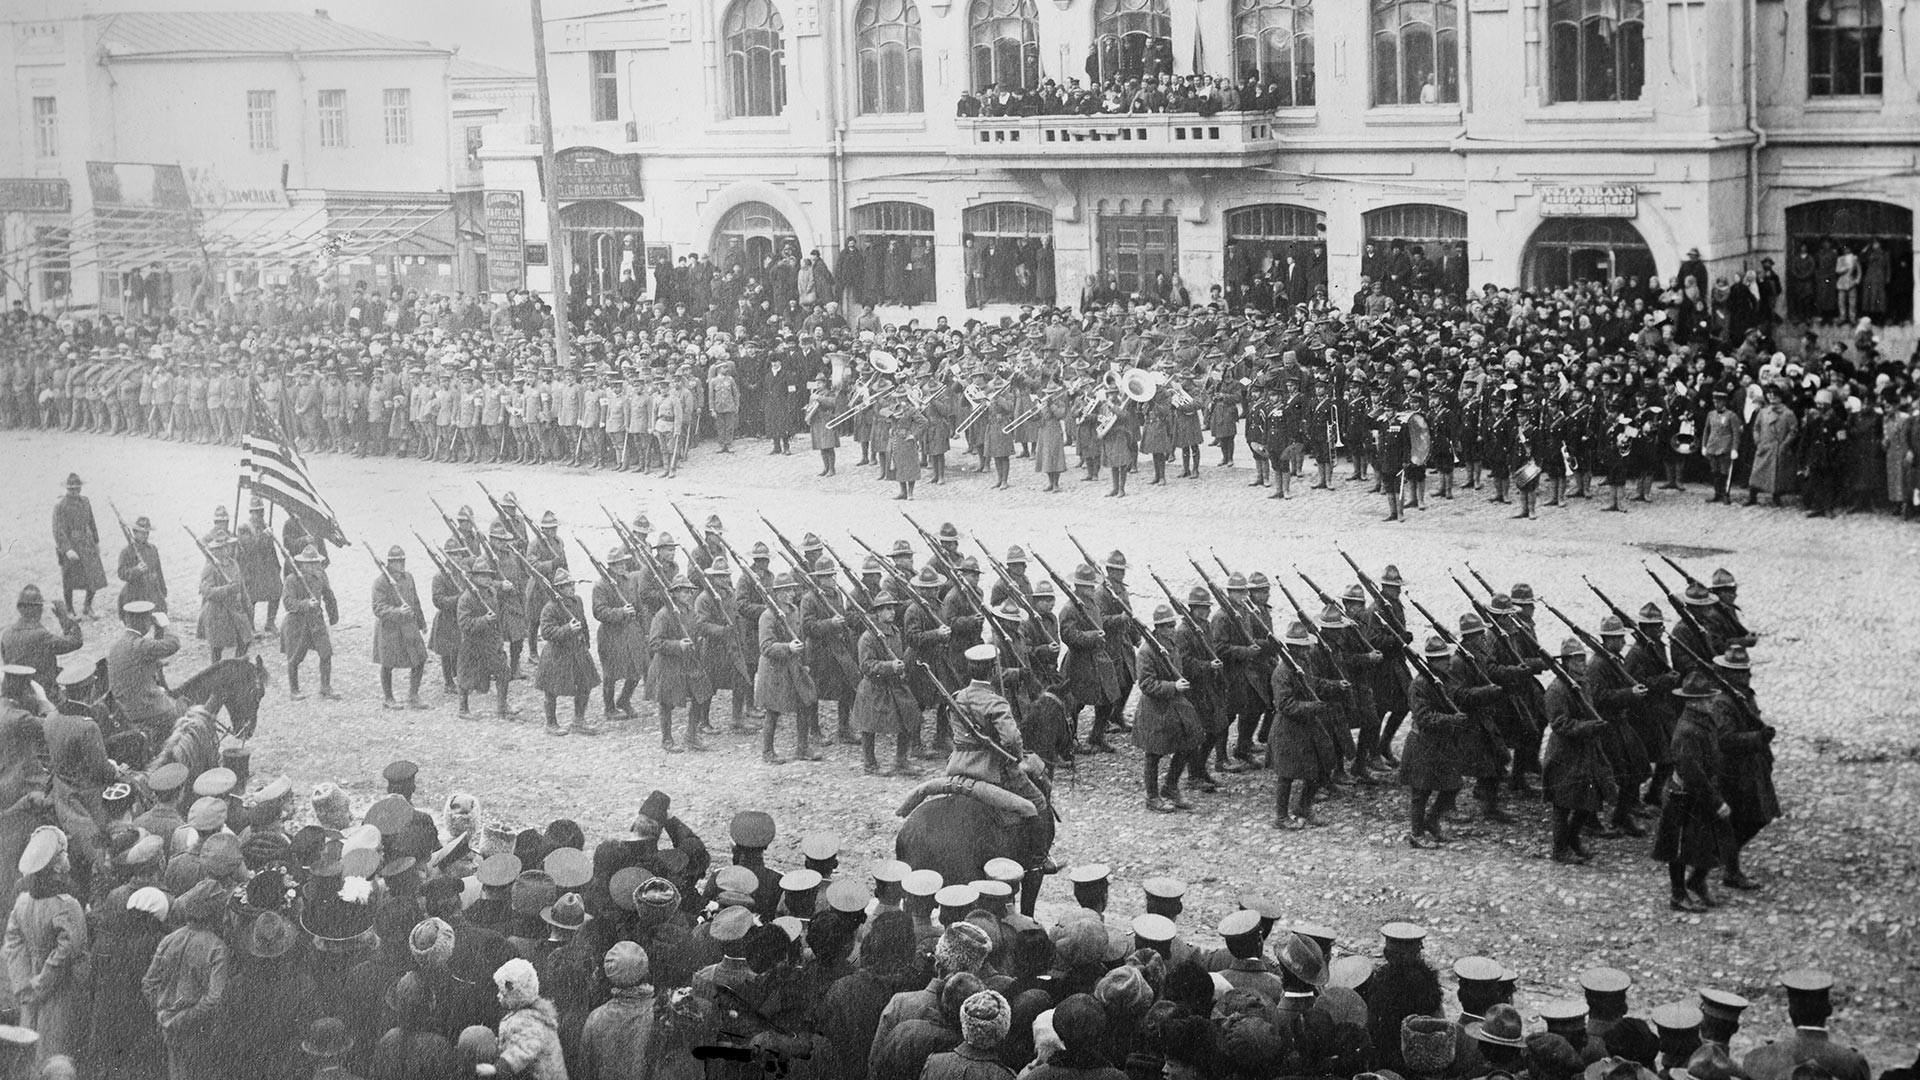 Die US-Truppen in Chabarowsk.